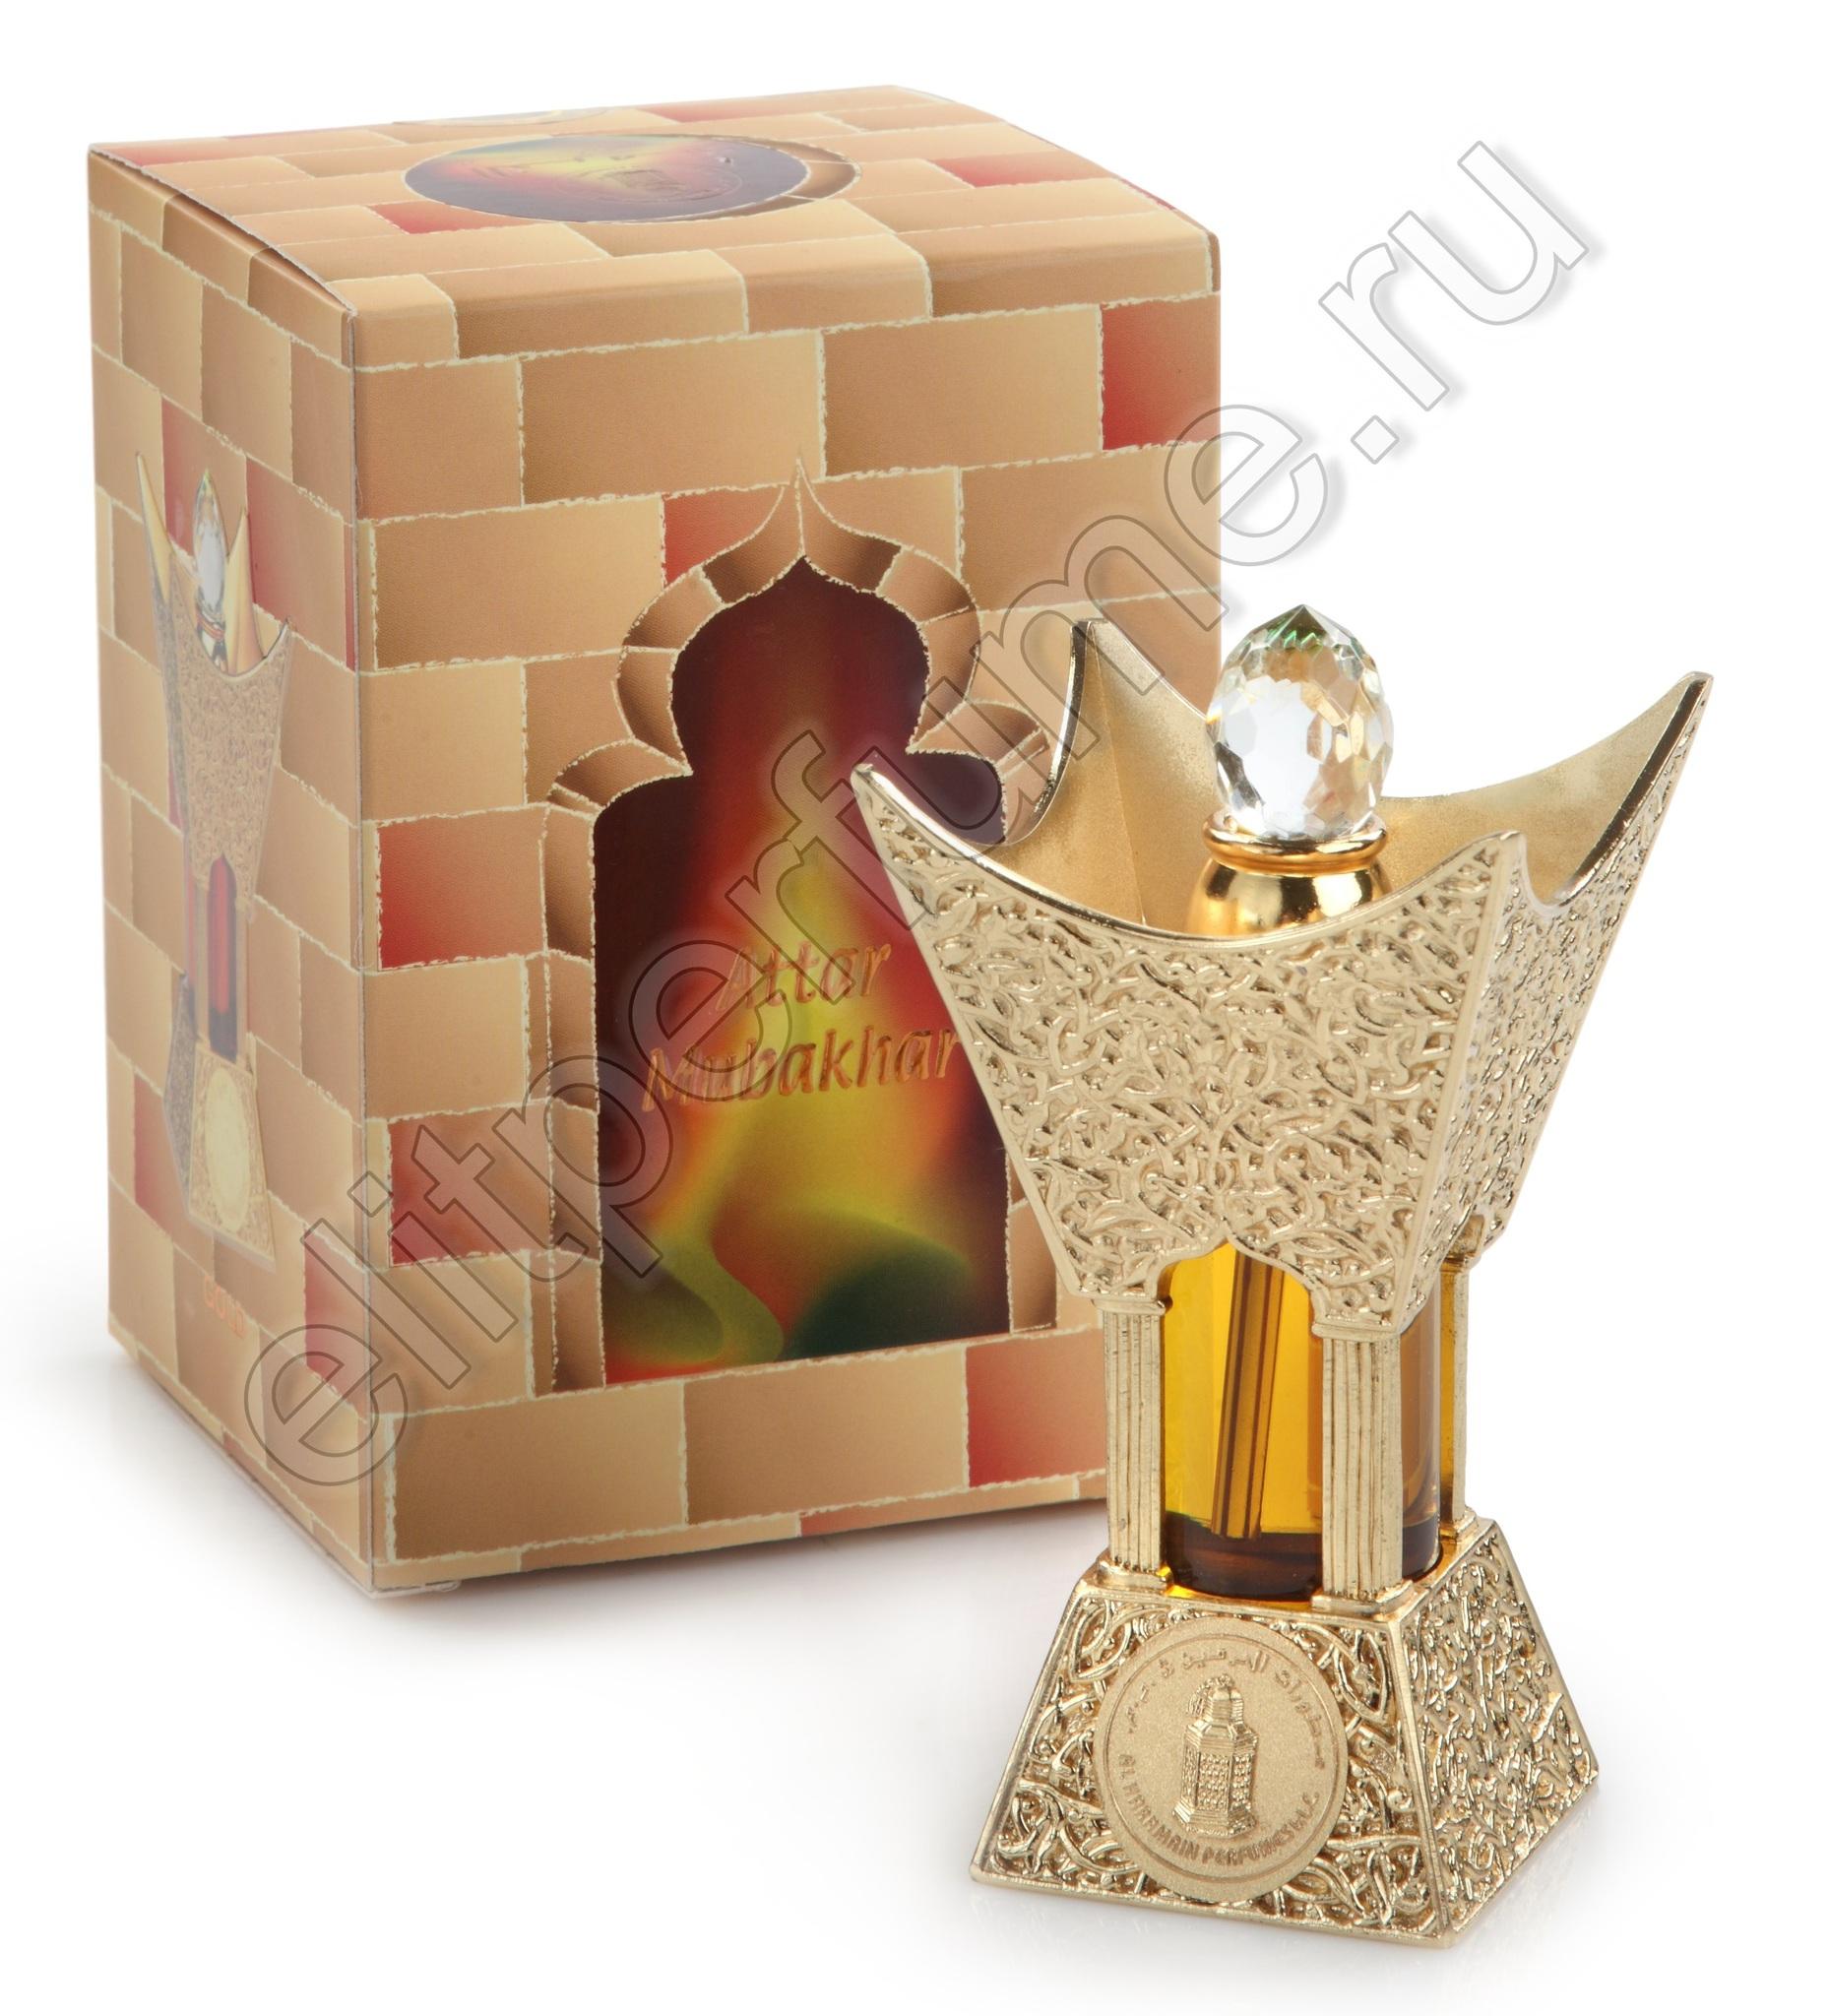 Пробники для духов Аттар Мубахар Attar Mubakhar 1 мл арабские масляные духи от Аль Харамайн Al Haramin Perfumes